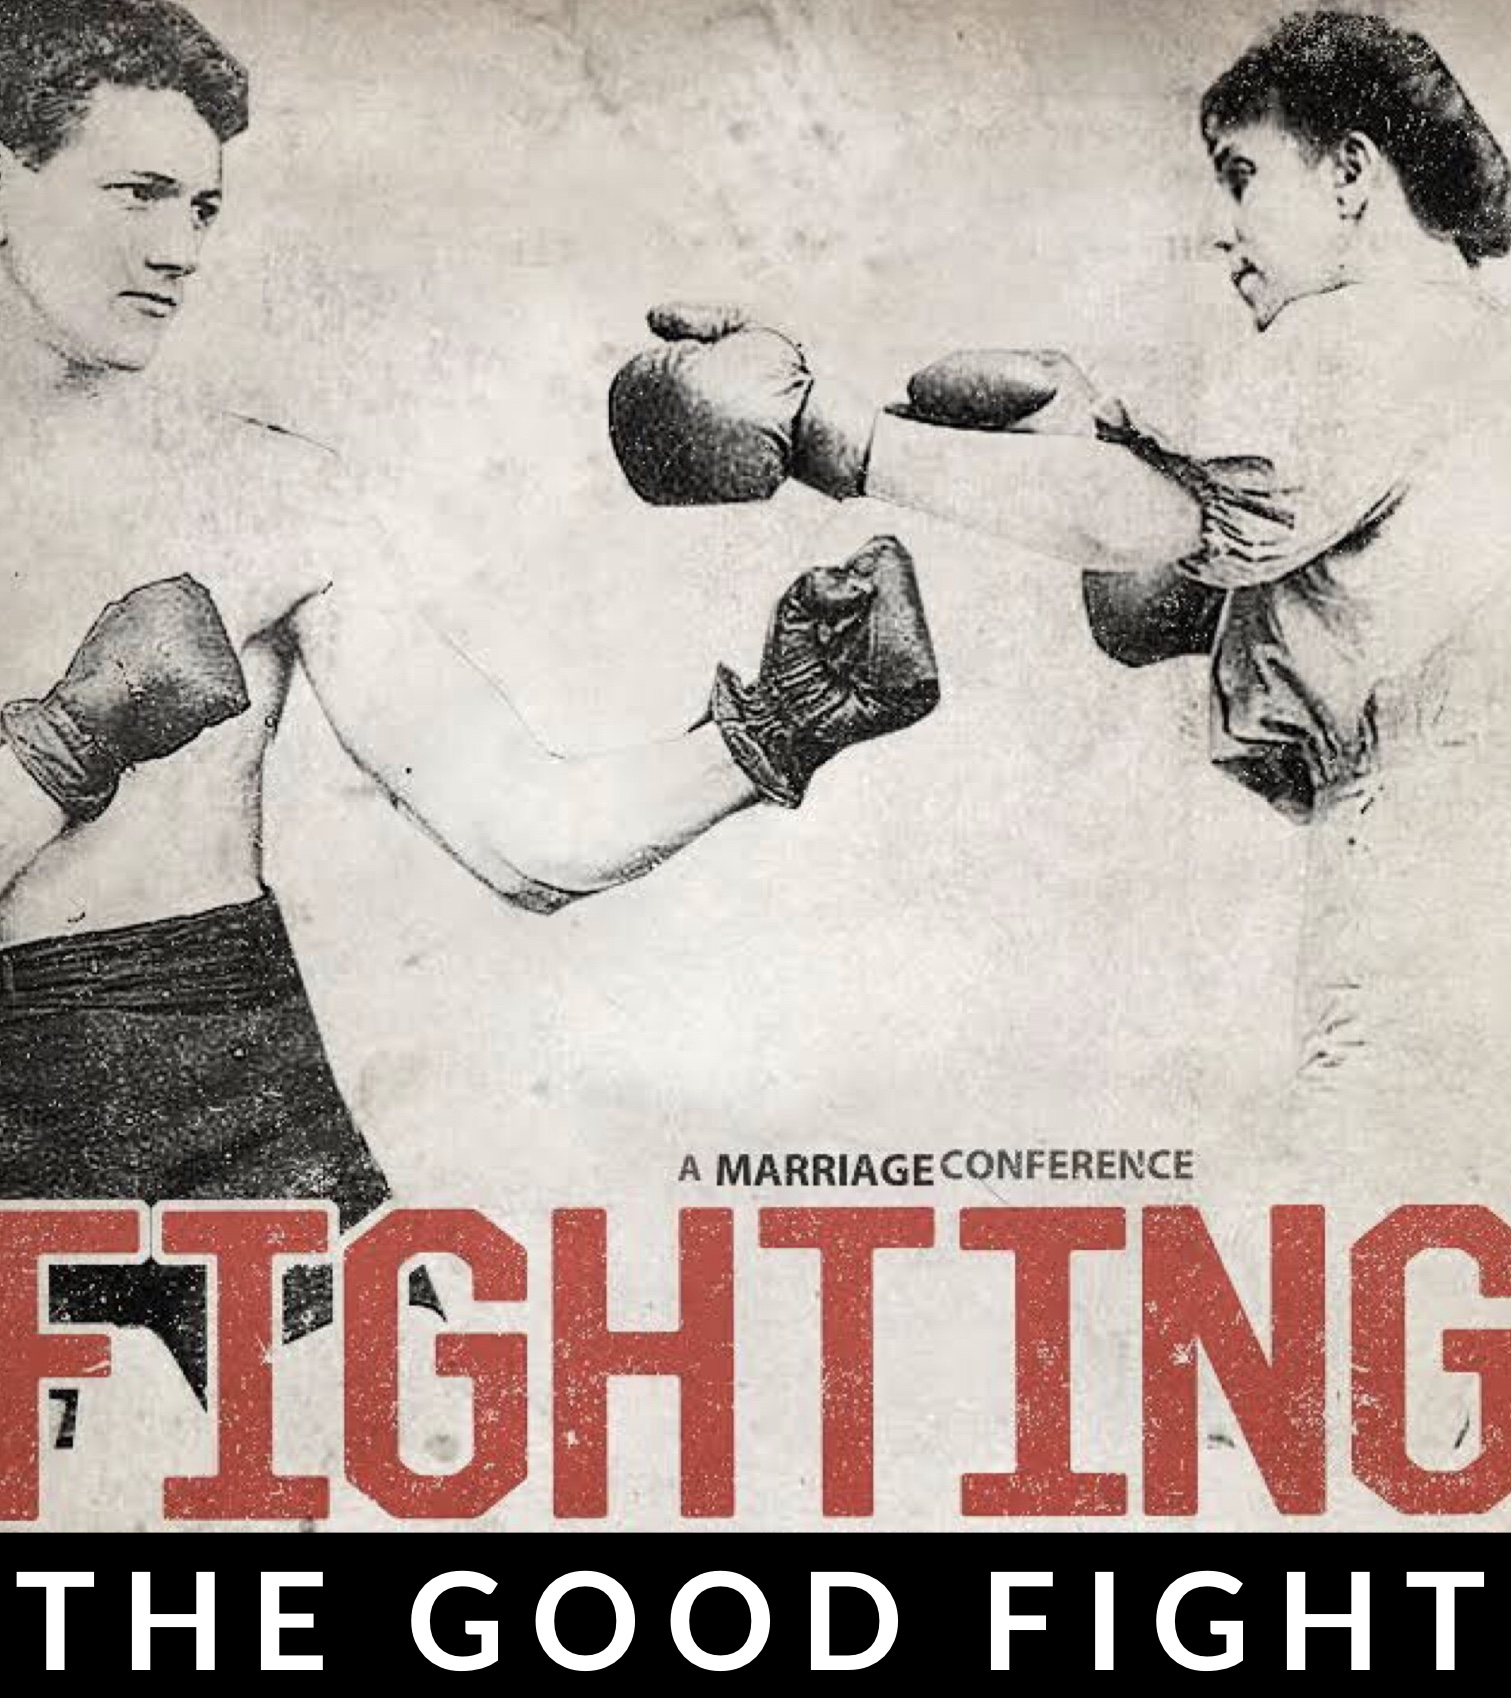 Fighting the good fight.jpg